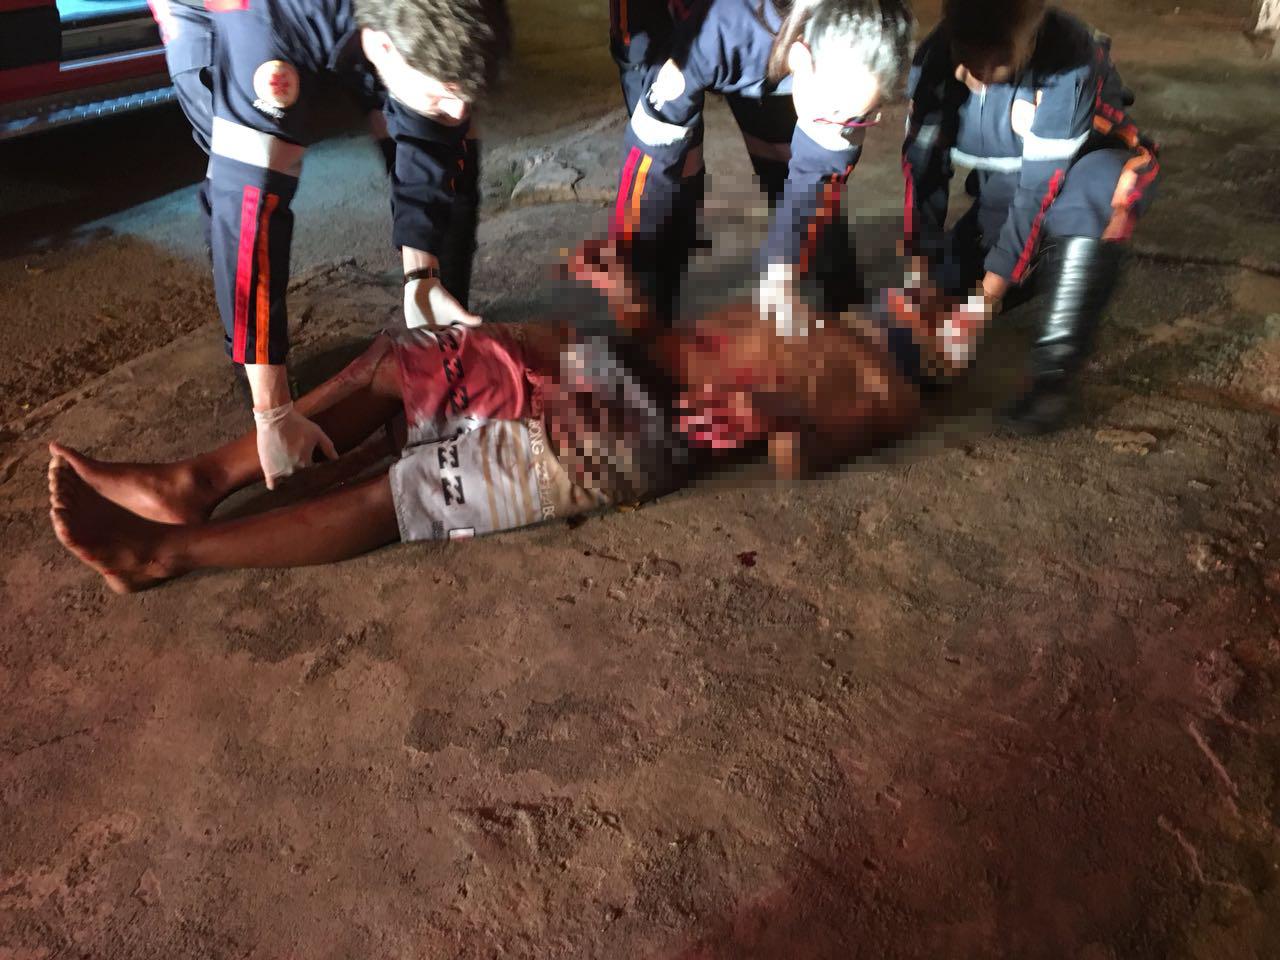 Jovem sofre tentativa de homicídio no Bairro Orozimbo Macedo